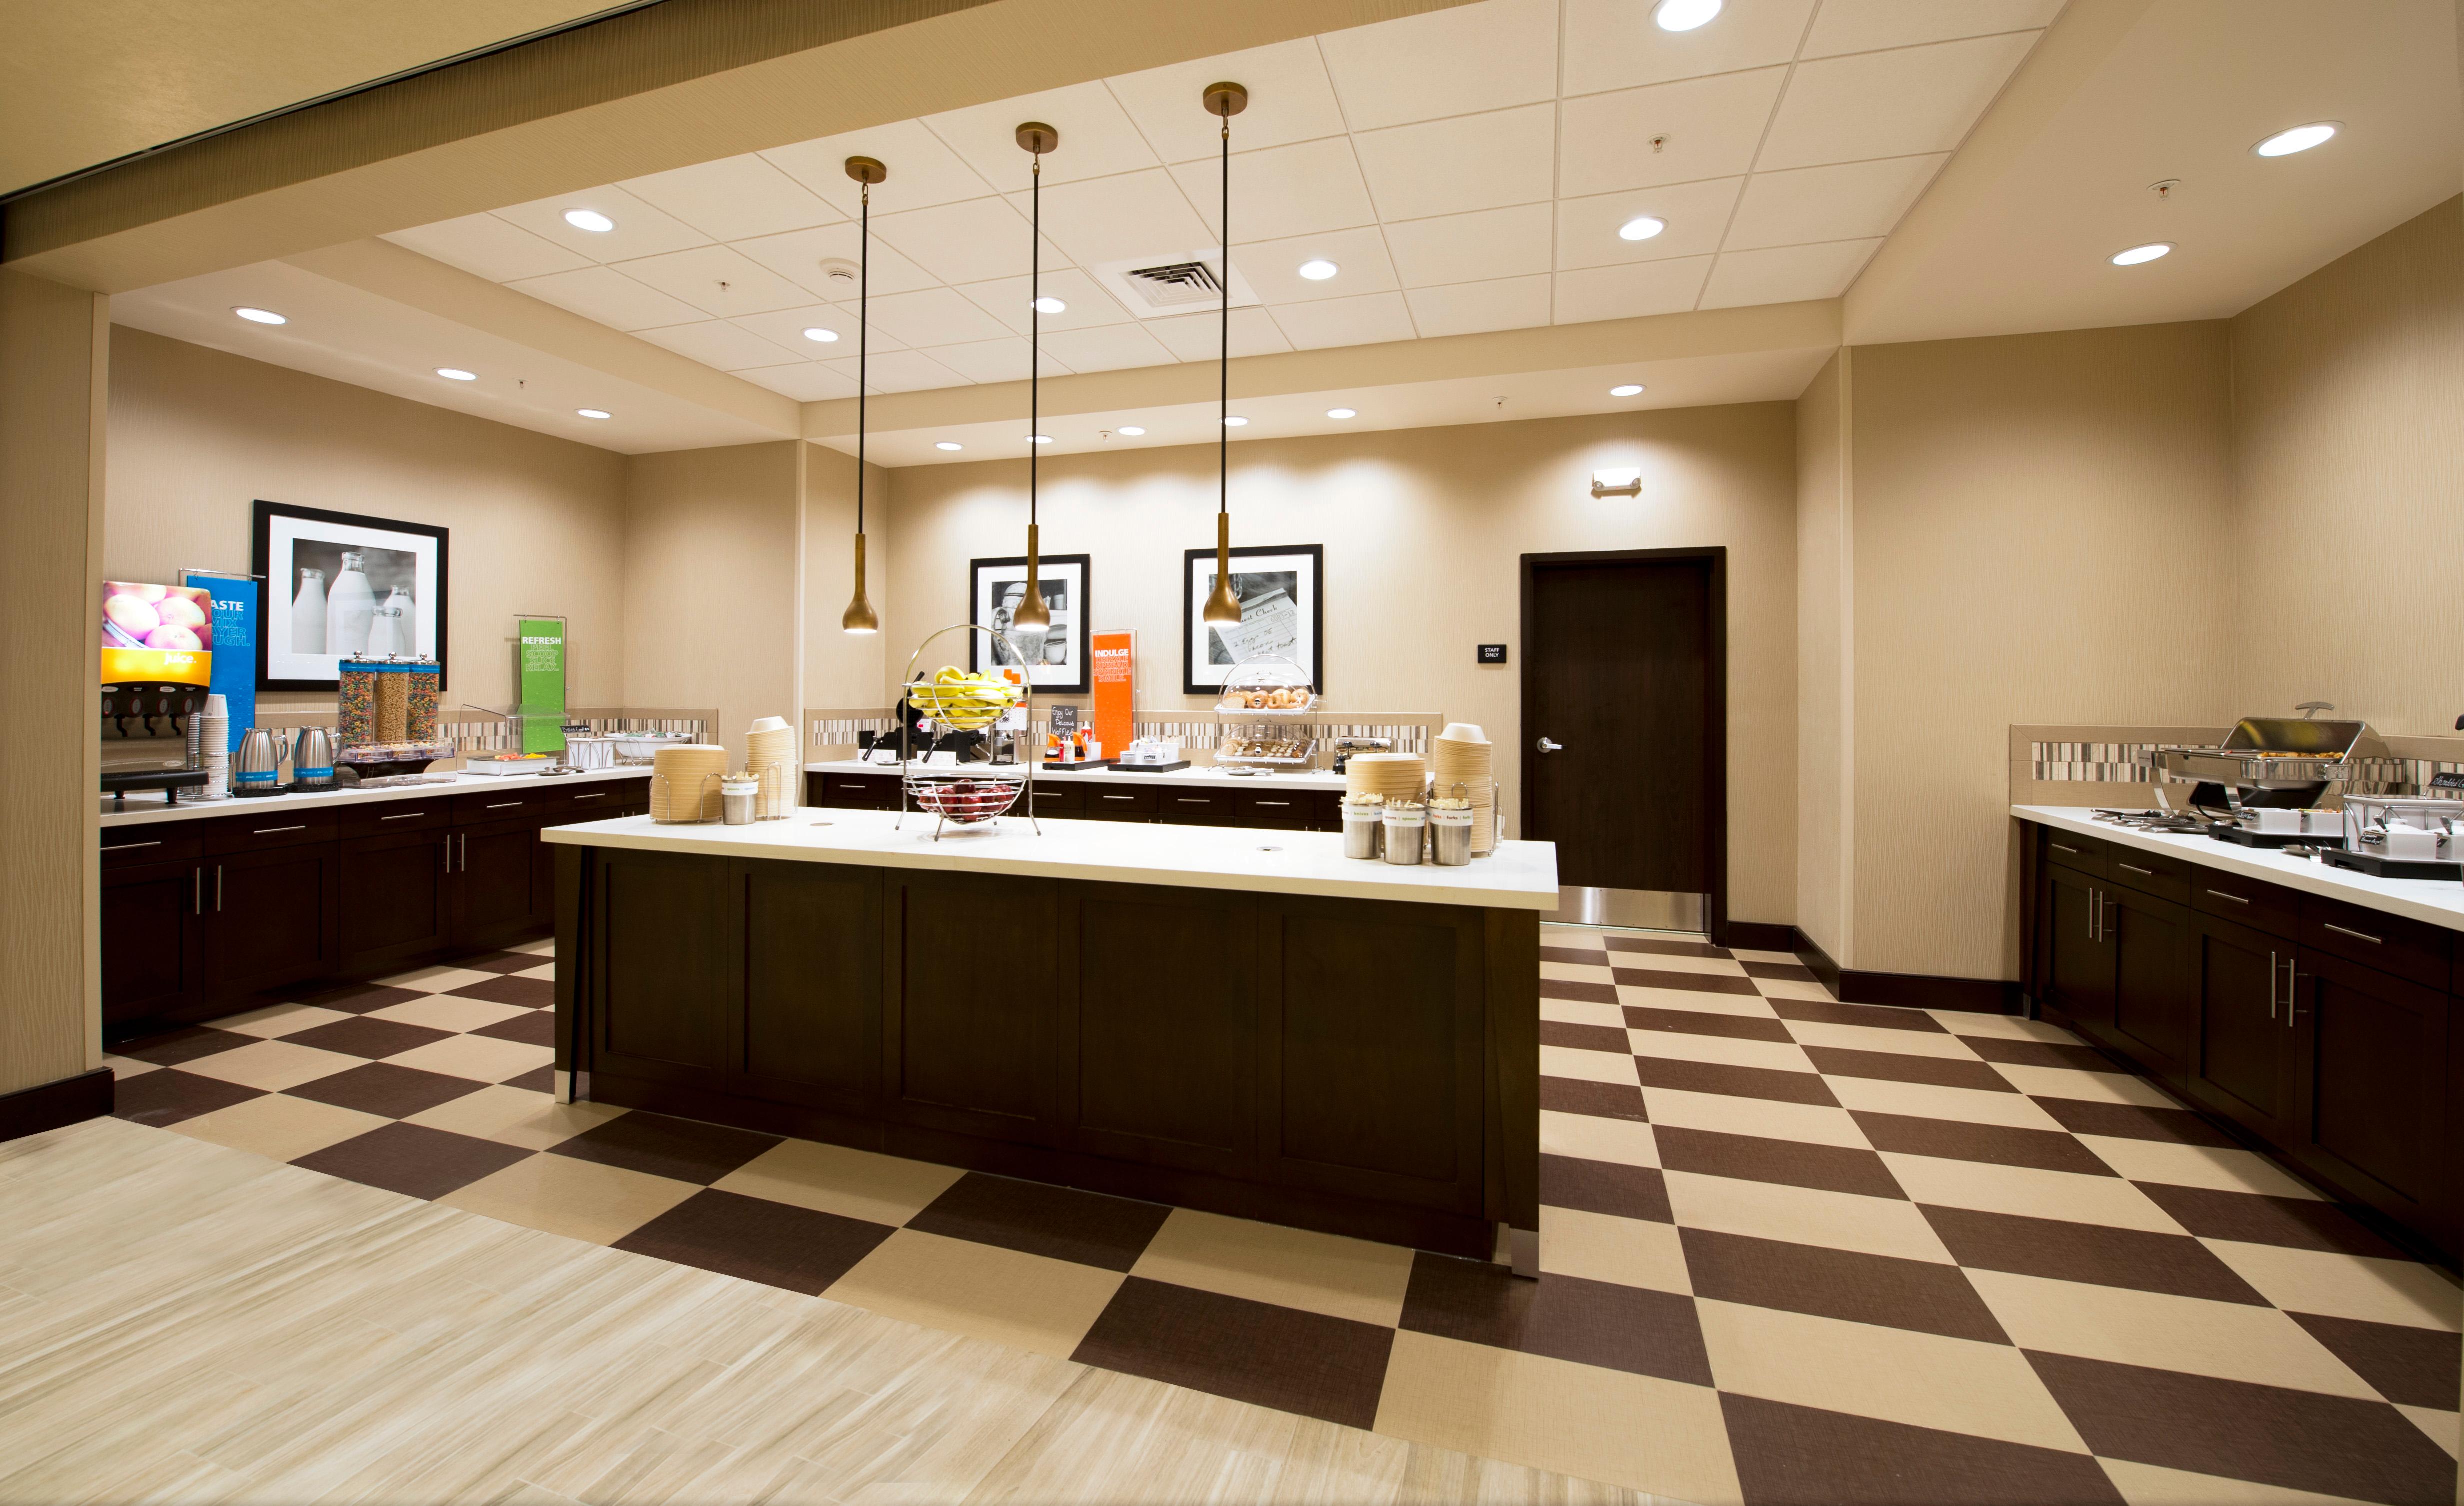 hampton inn suites orangeburg orangeburg south carolina. Black Bedroom Furniture Sets. Home Design Ideas